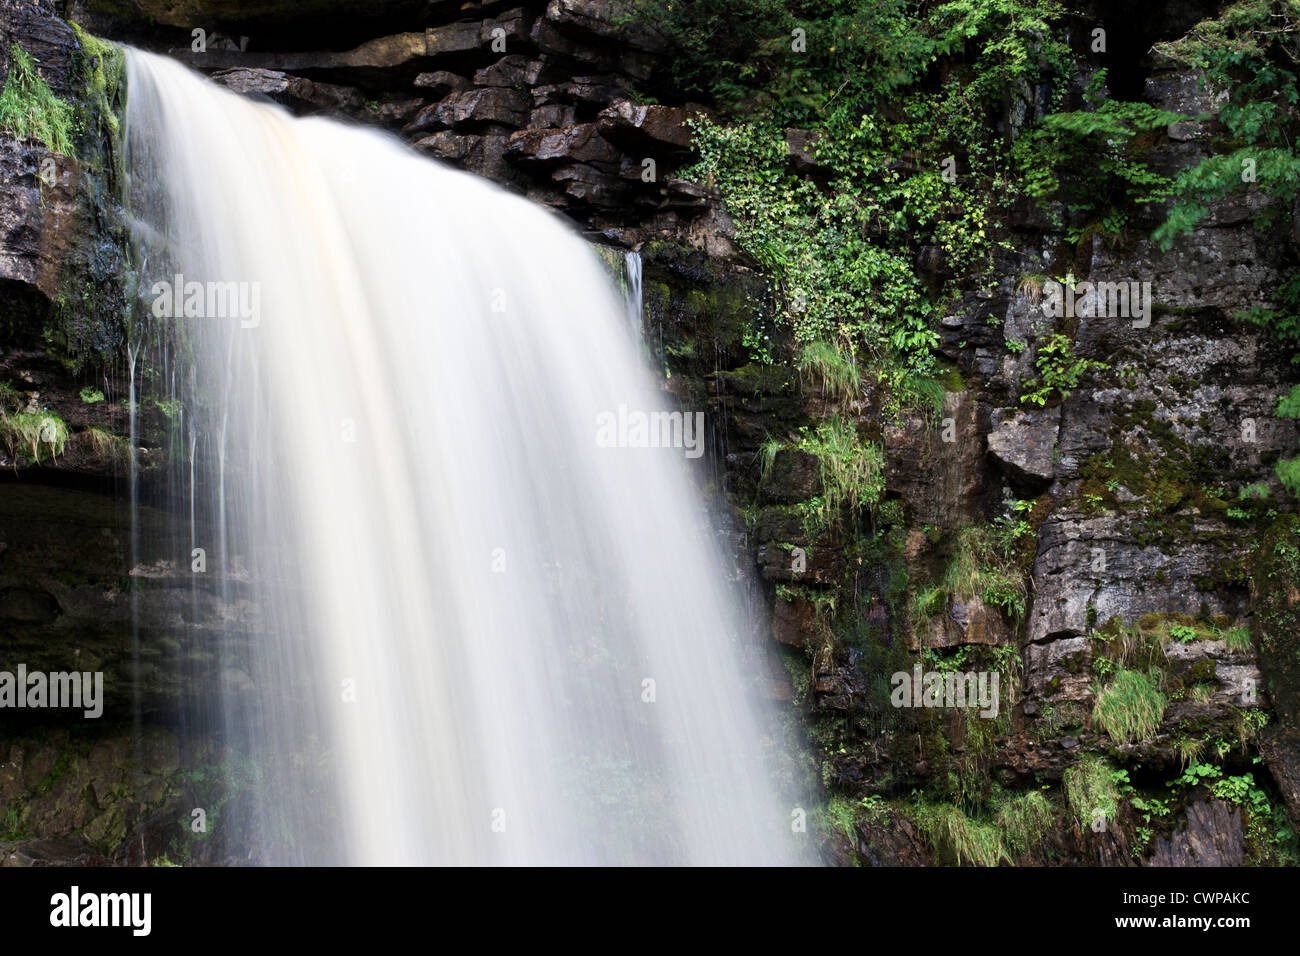 L'eau en cascade de Thornton, Force Ingleton, Yorkshire du Nord Photo Stock